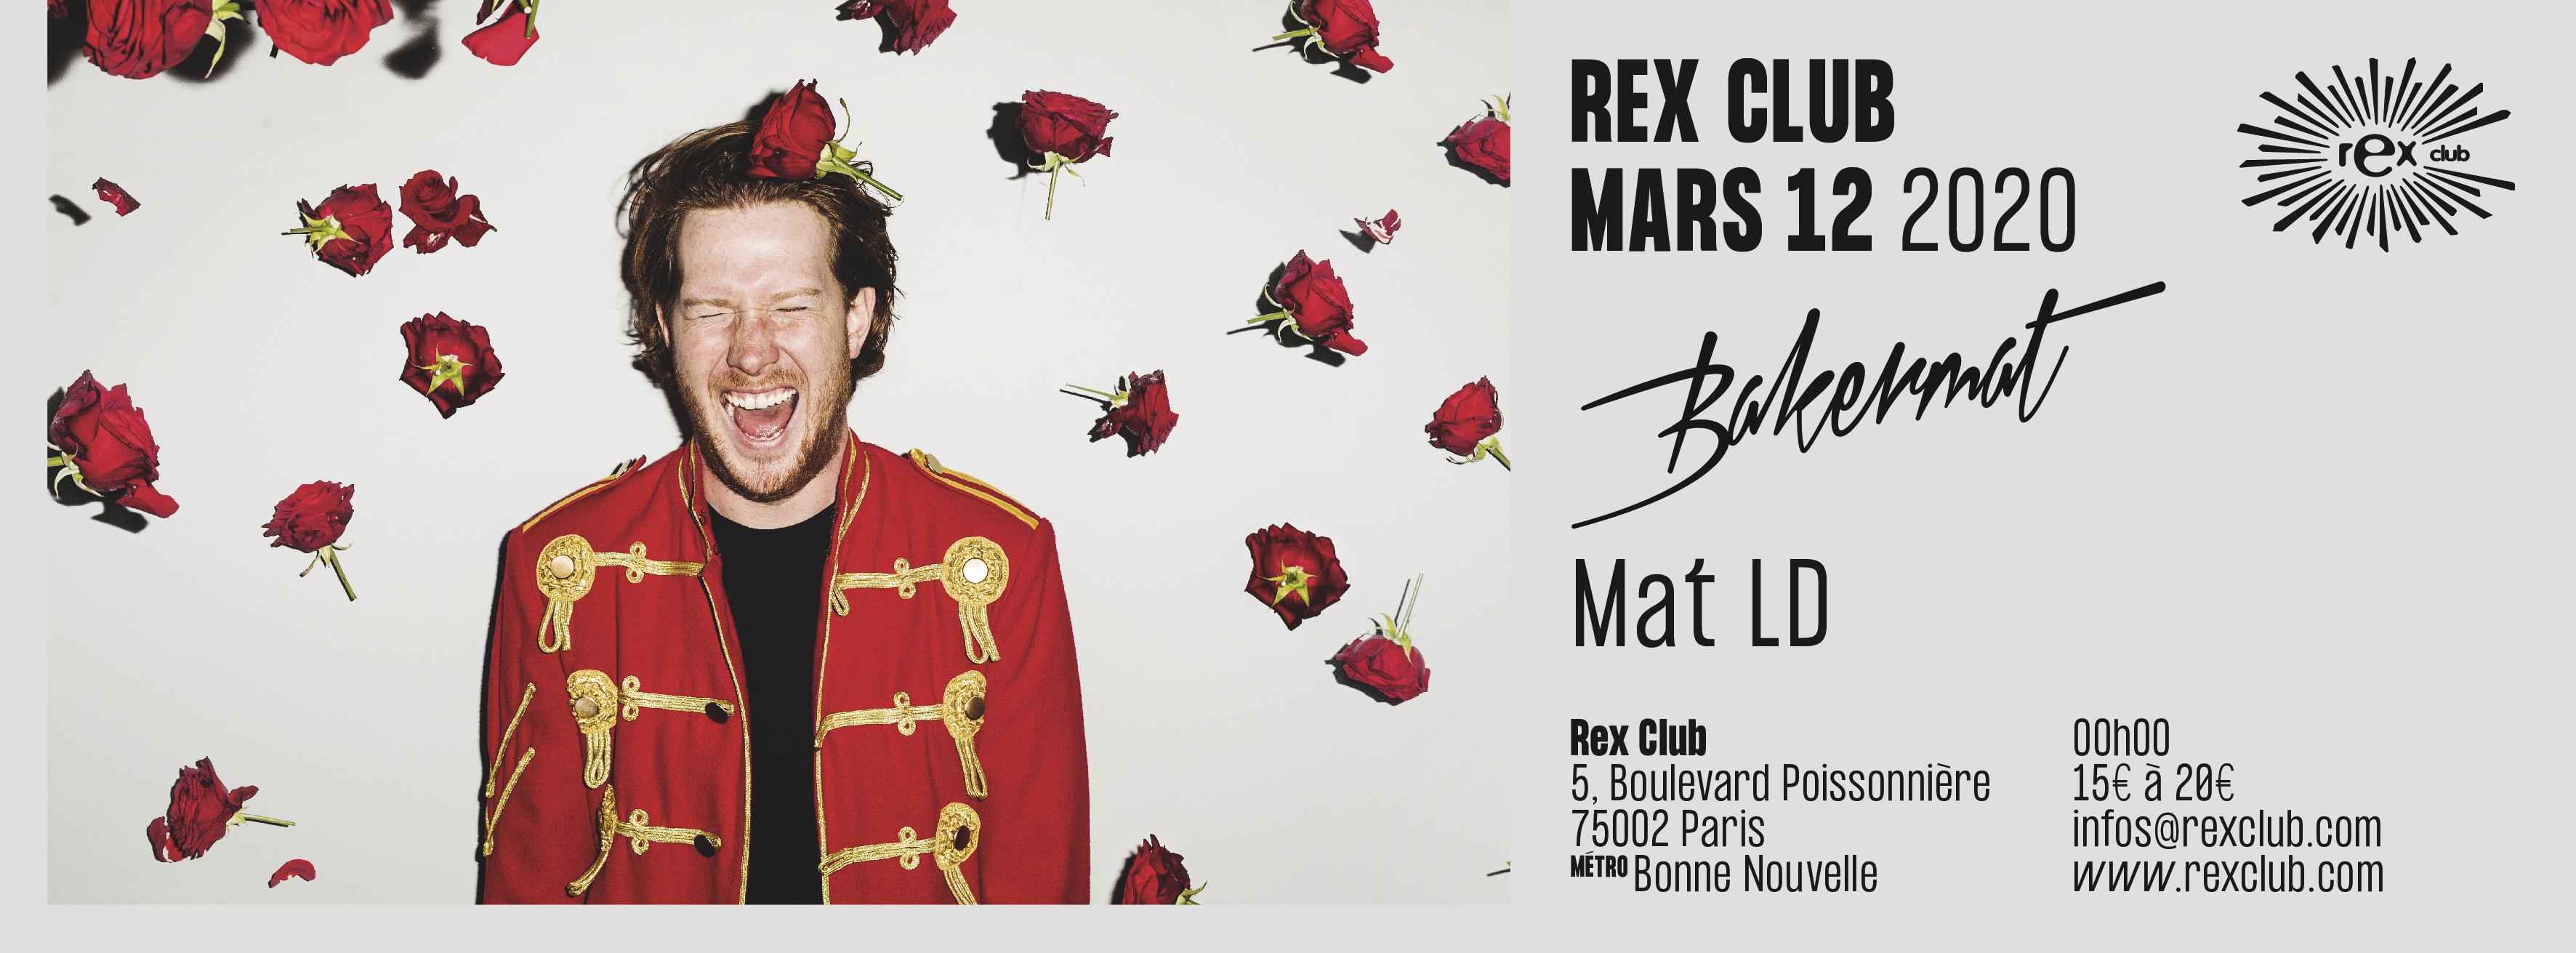 Rex Club Présente: Bakermat & Mat Ld